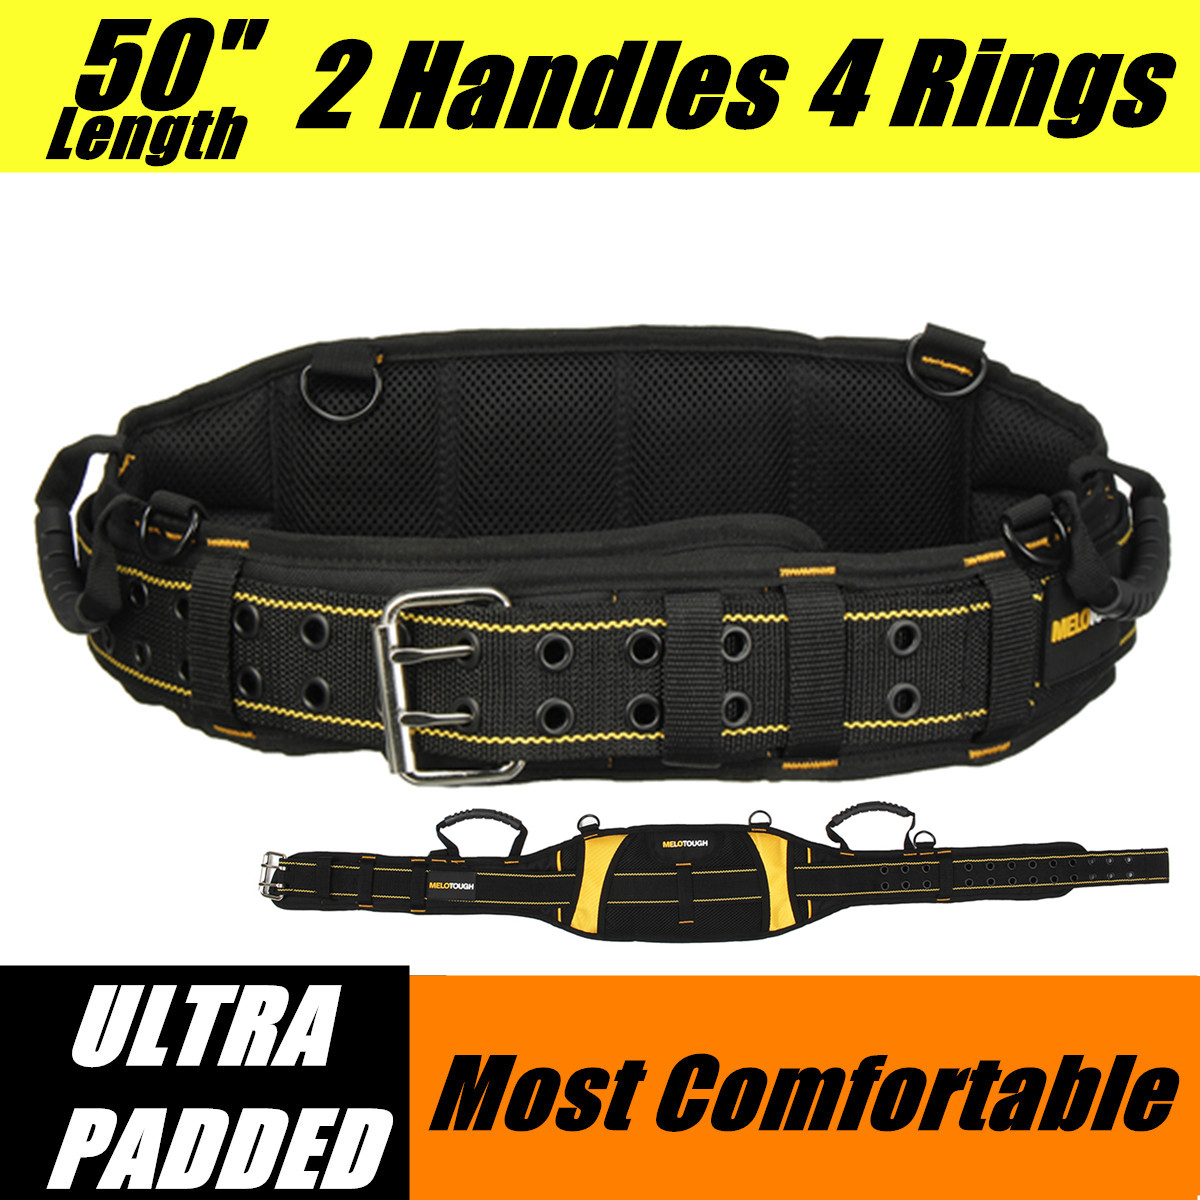 Multi function Electrician Tool Bag Waist Pocket Waist Reduce Weight Bearing Tooling Strap Kit Belt Storage Holder Organizer|Tool Bags| |  - title=